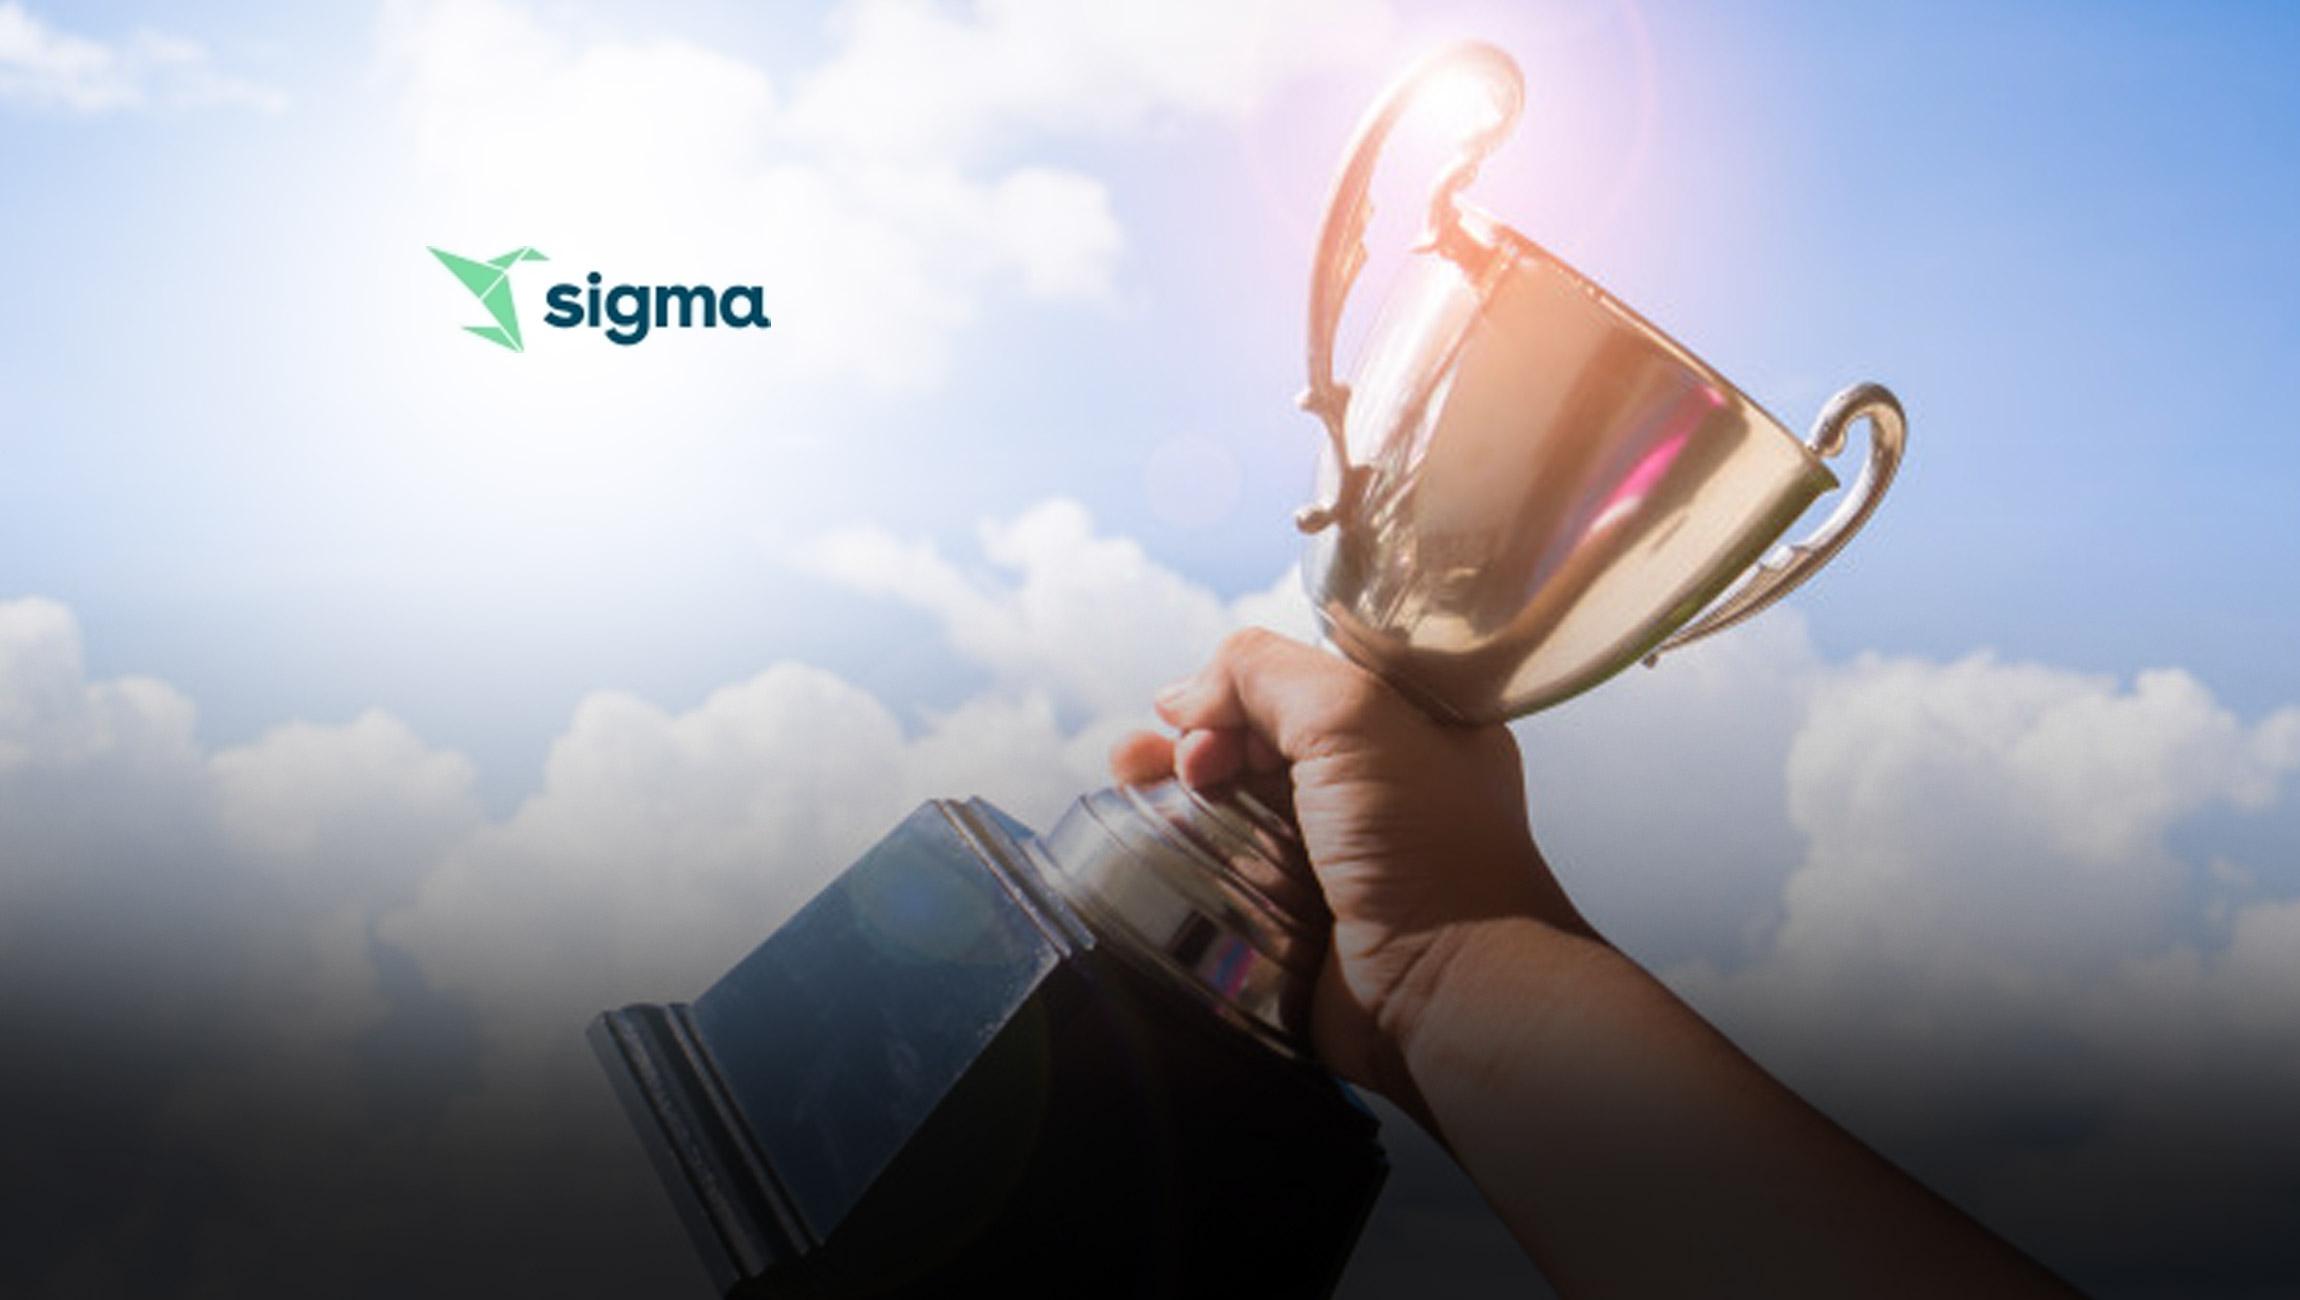 Sigma-Computing-Wins-2021-BIG-Innovation-Award